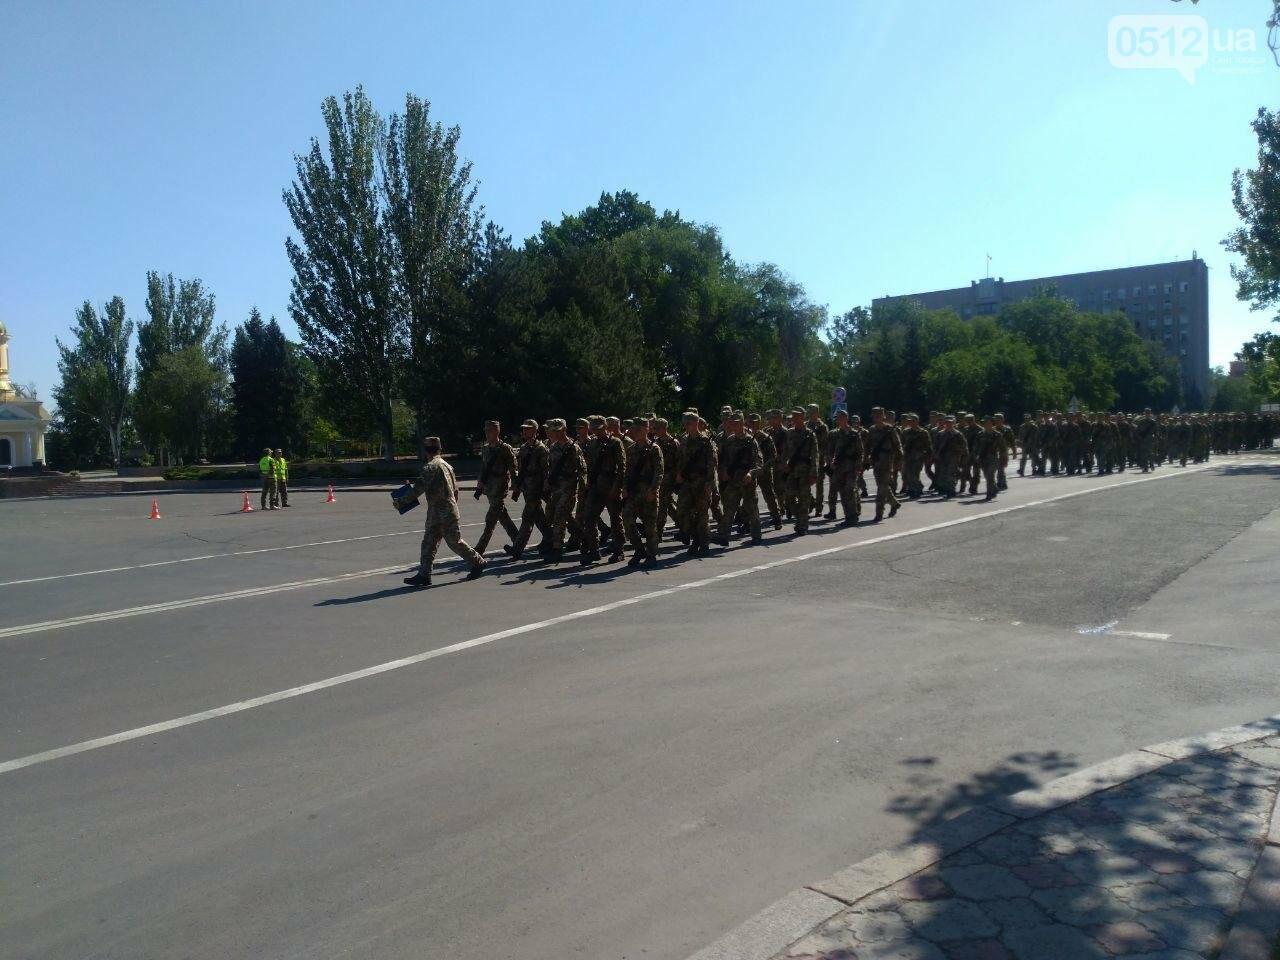 Завтра утром перекроют улицу Адмиральскую, - ФОТО, фото-1